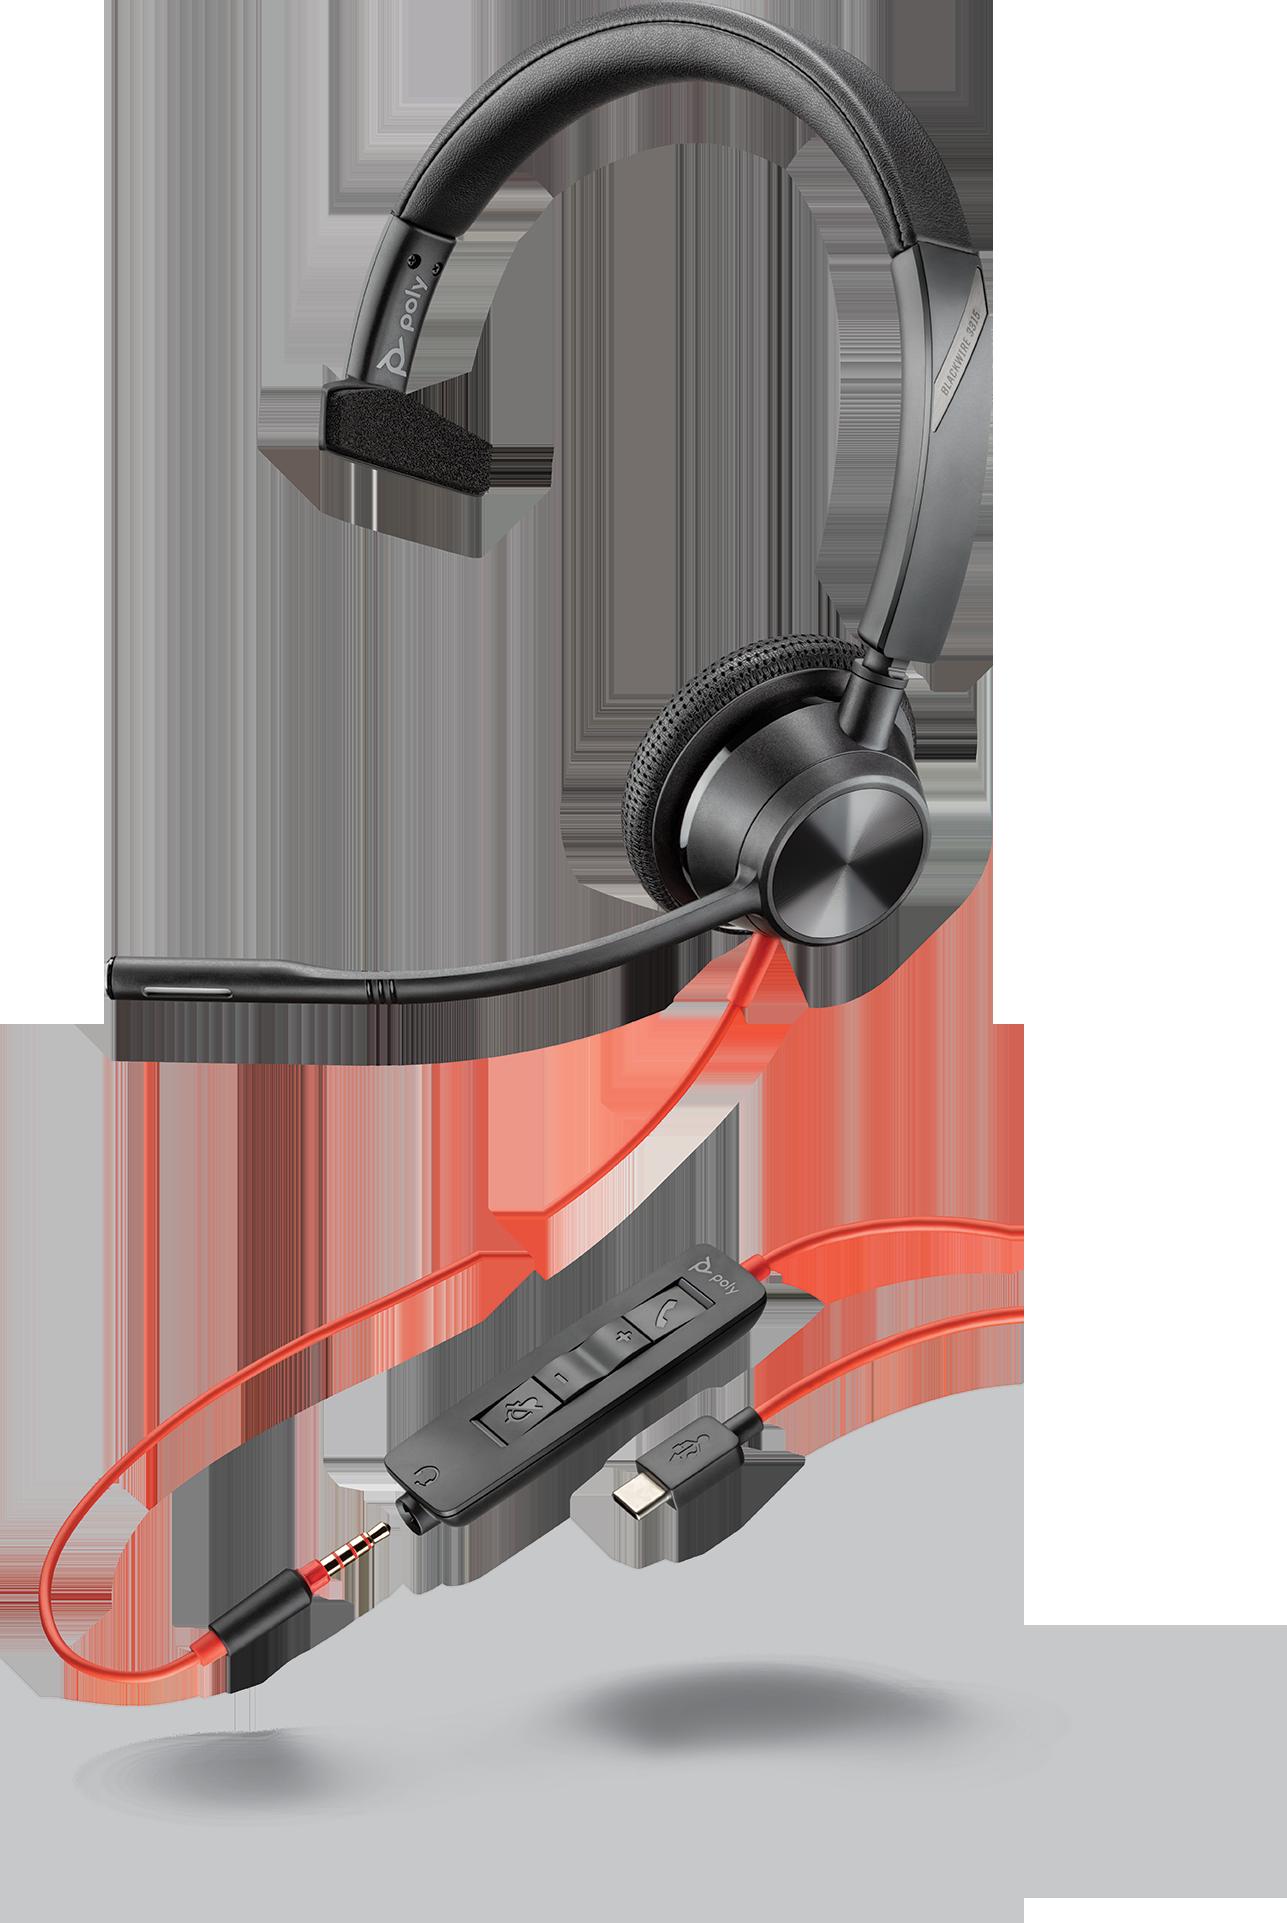 Plantronics Blackwire 3315 USB-C Headset